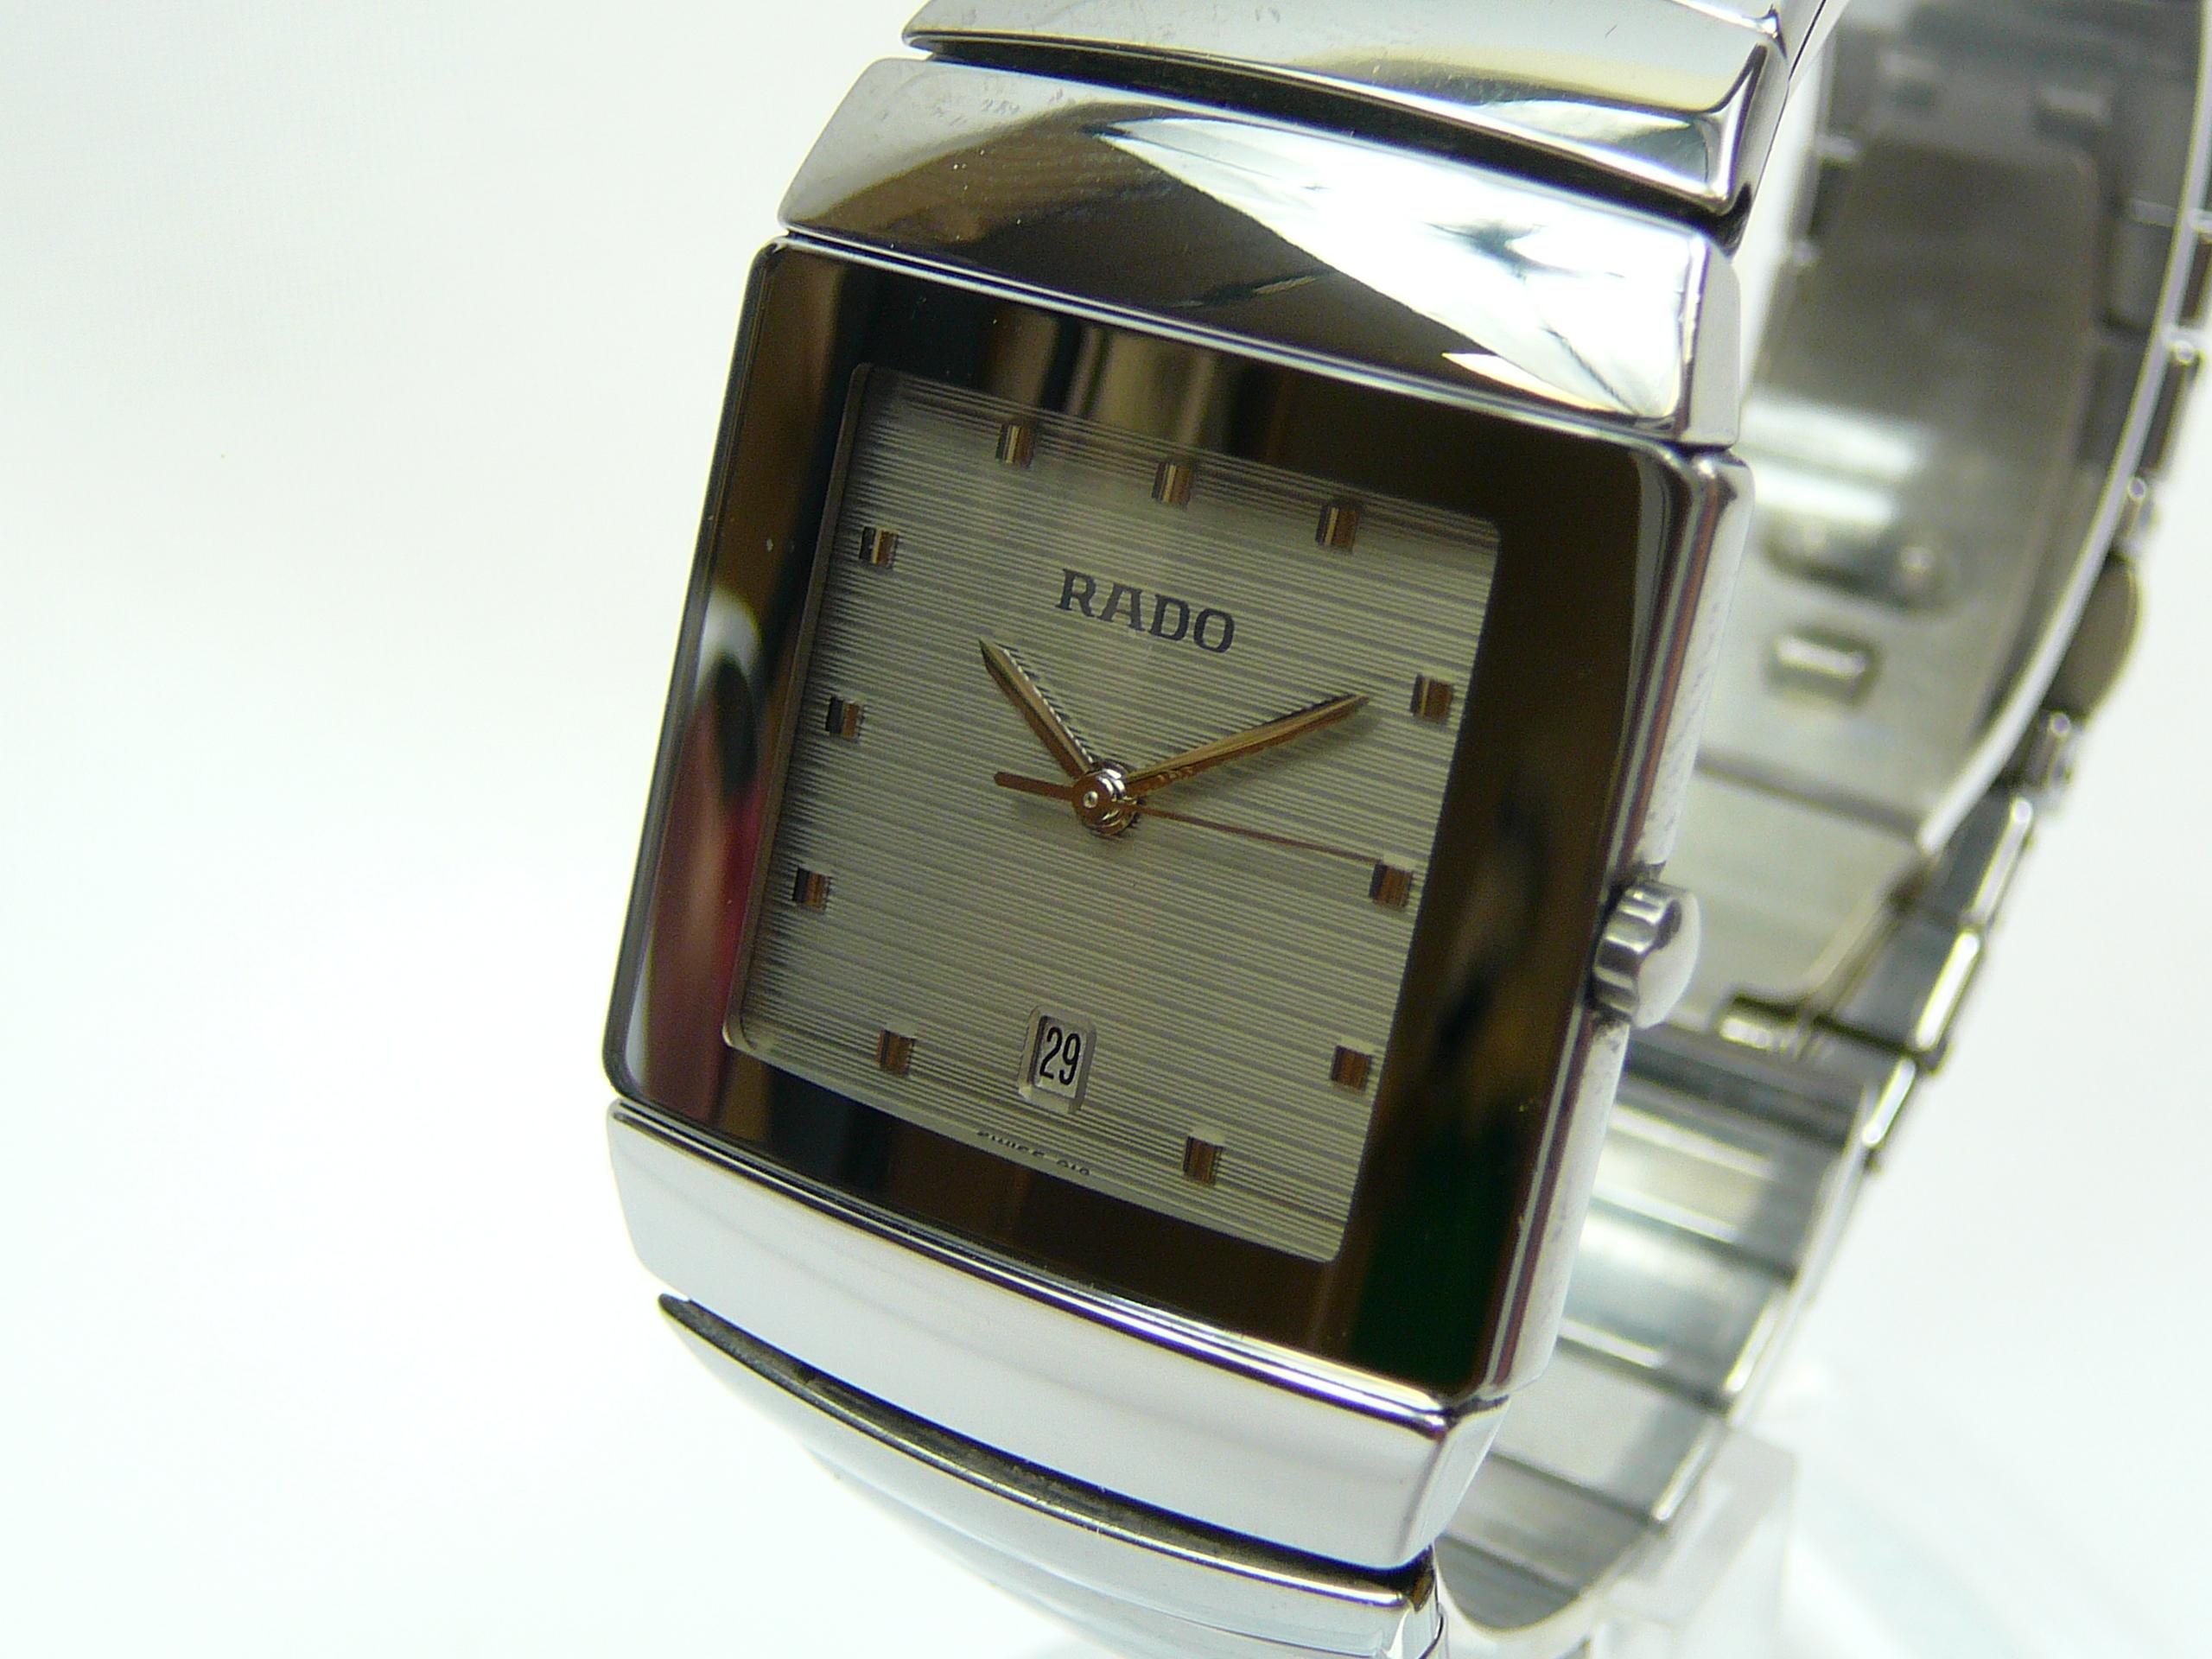 Gents Rado Wrist Watch - Image 2 of 3